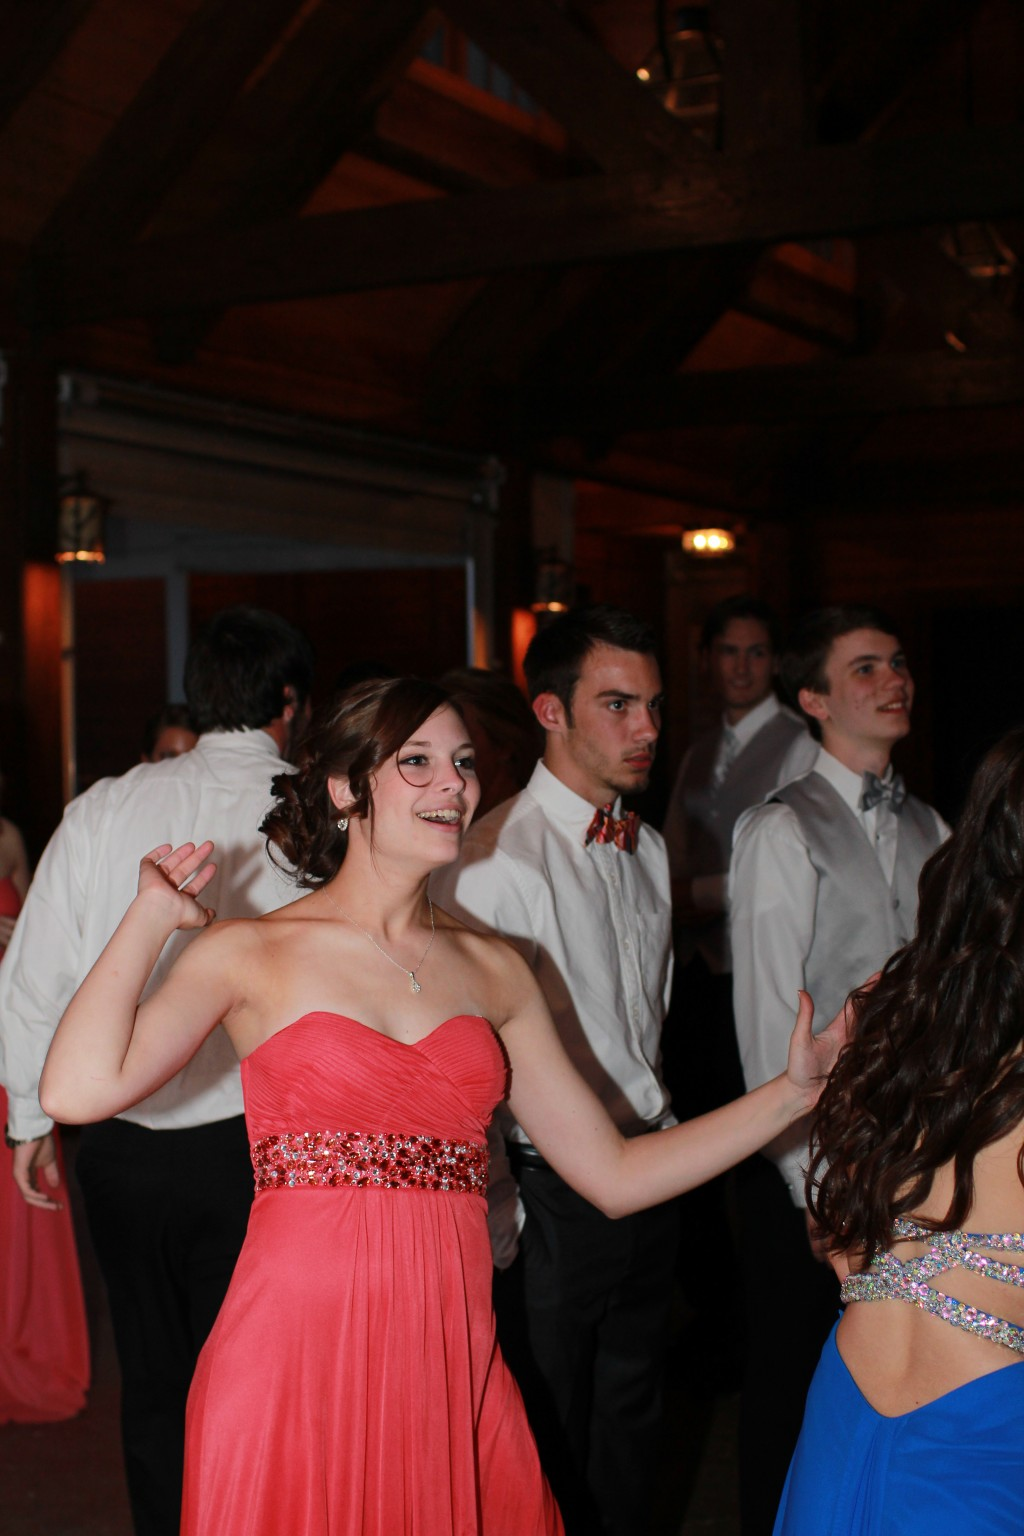 Candid Prom Night